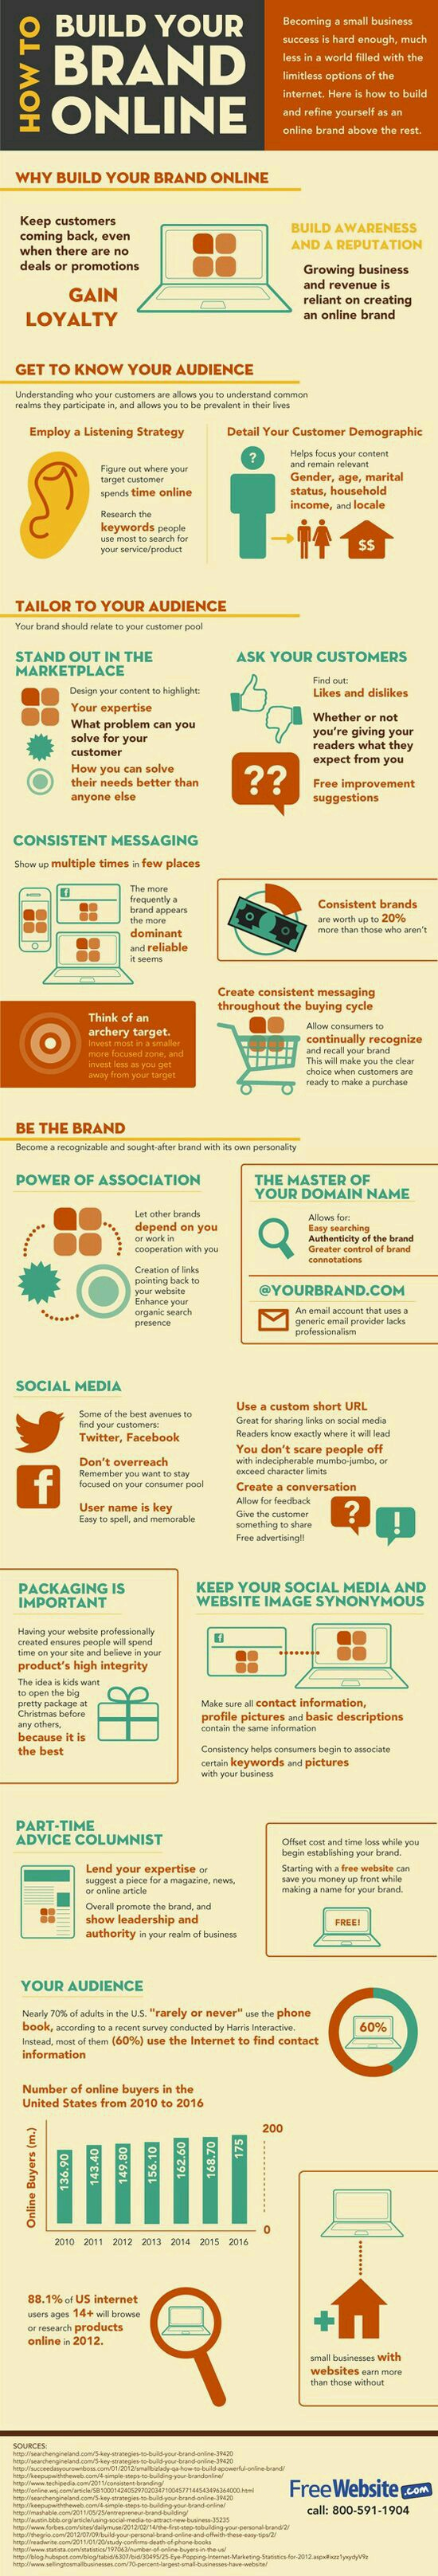 How to build your brand online - #infografica - #marketing #diellegrafica